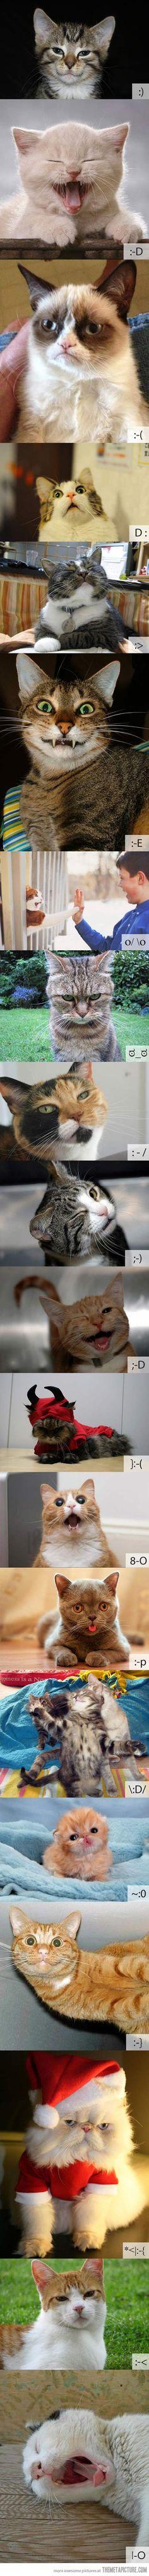 Cats emoticons.